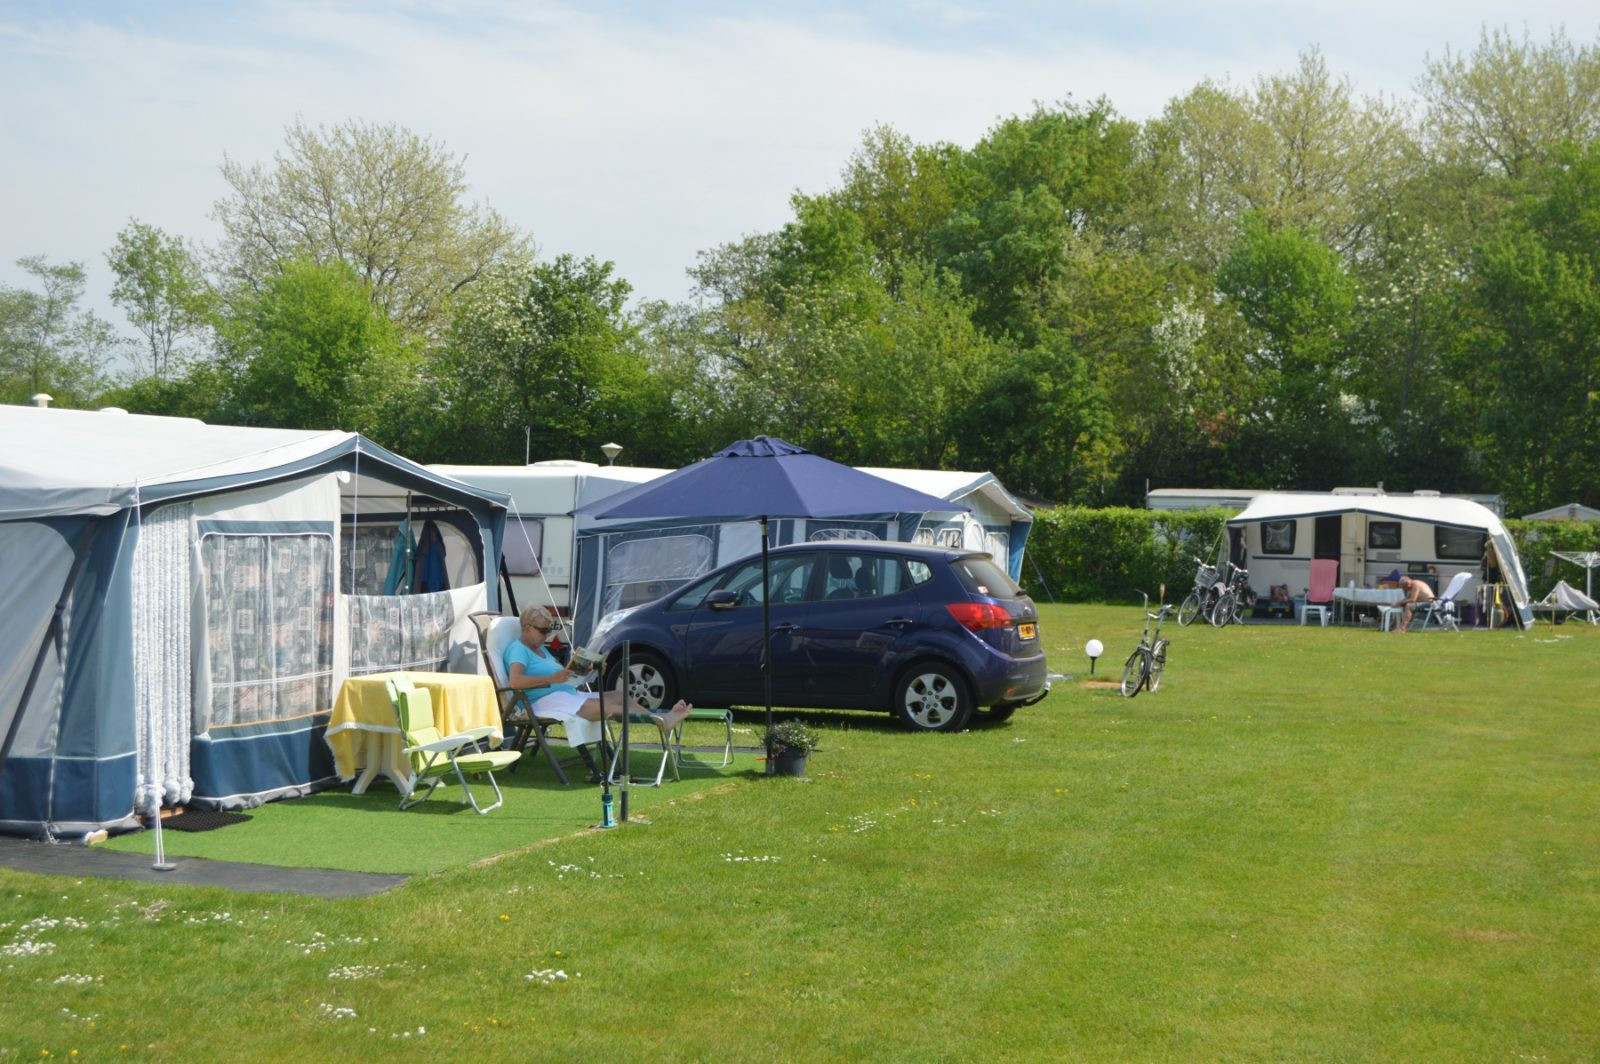 camping-rotandorp-drenthe-friesland 4